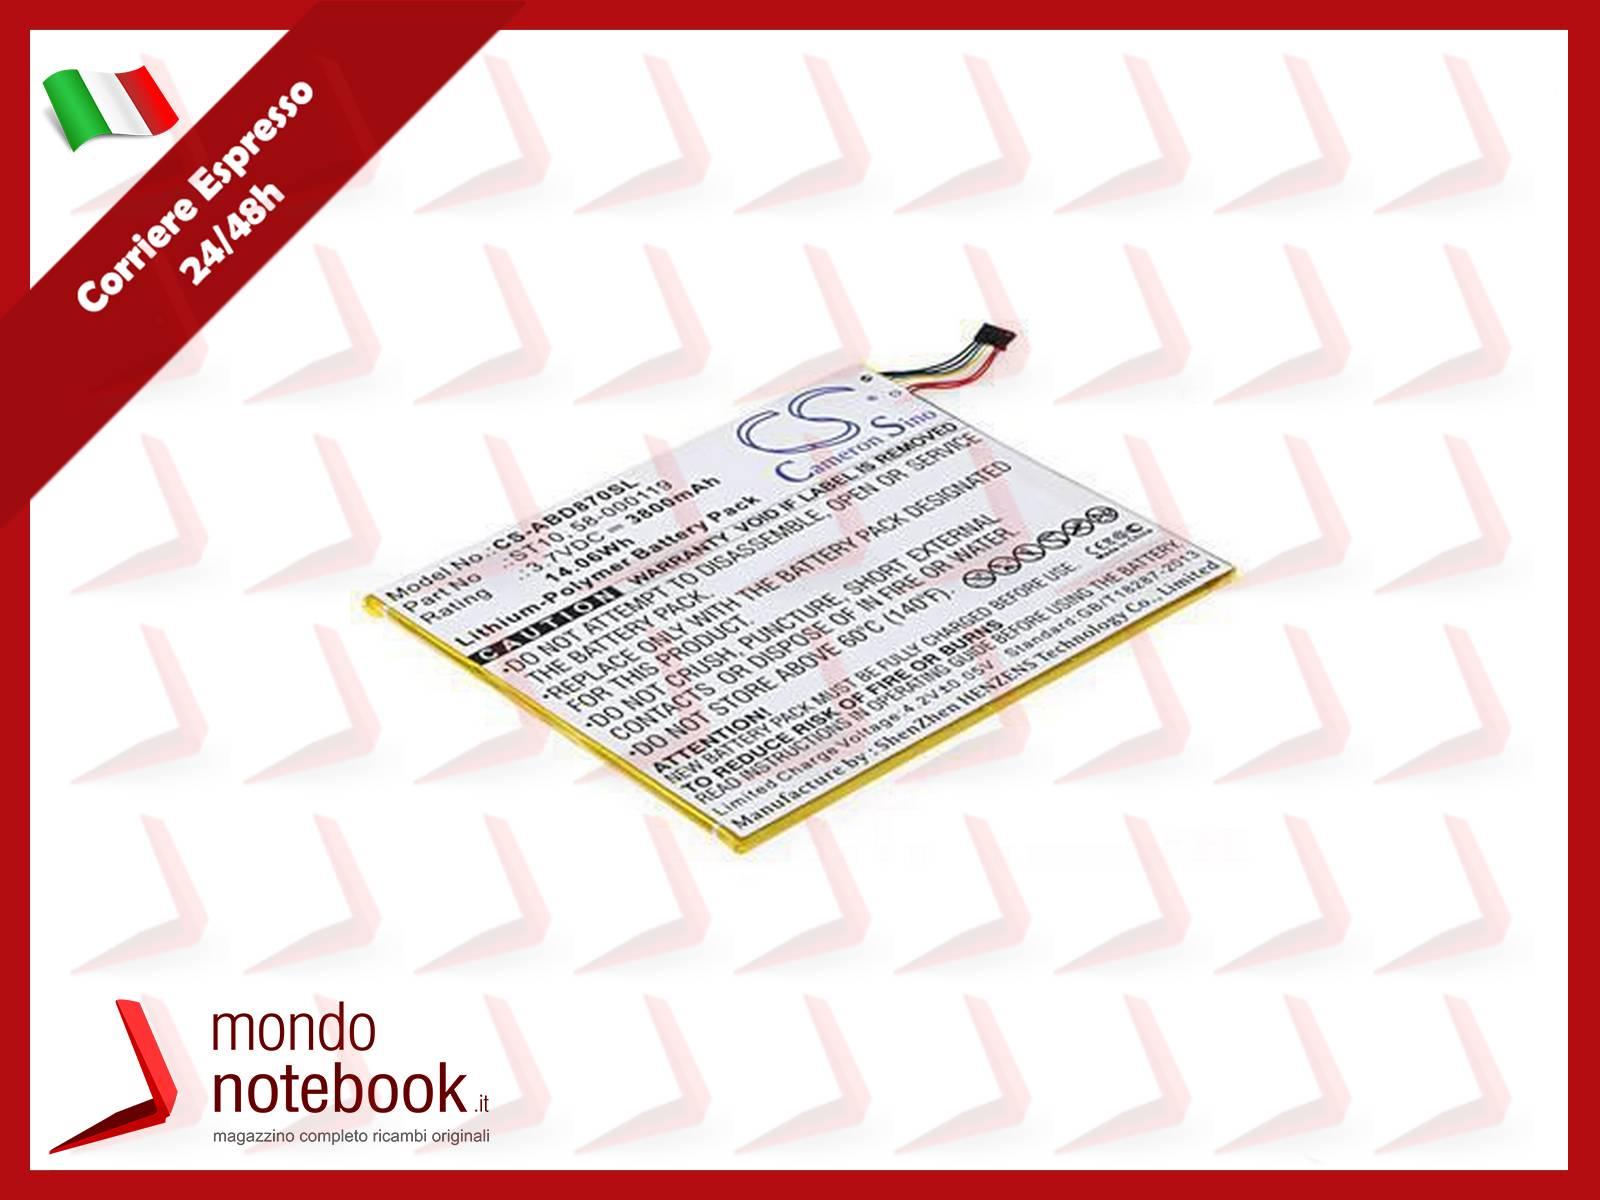 https://www.mondonotebook.it/12182/ventola-fan-cpu-hp-touchsmart-600-1150qd-1152-1155-1160ch-f99t-f82q-4-pin.jpg